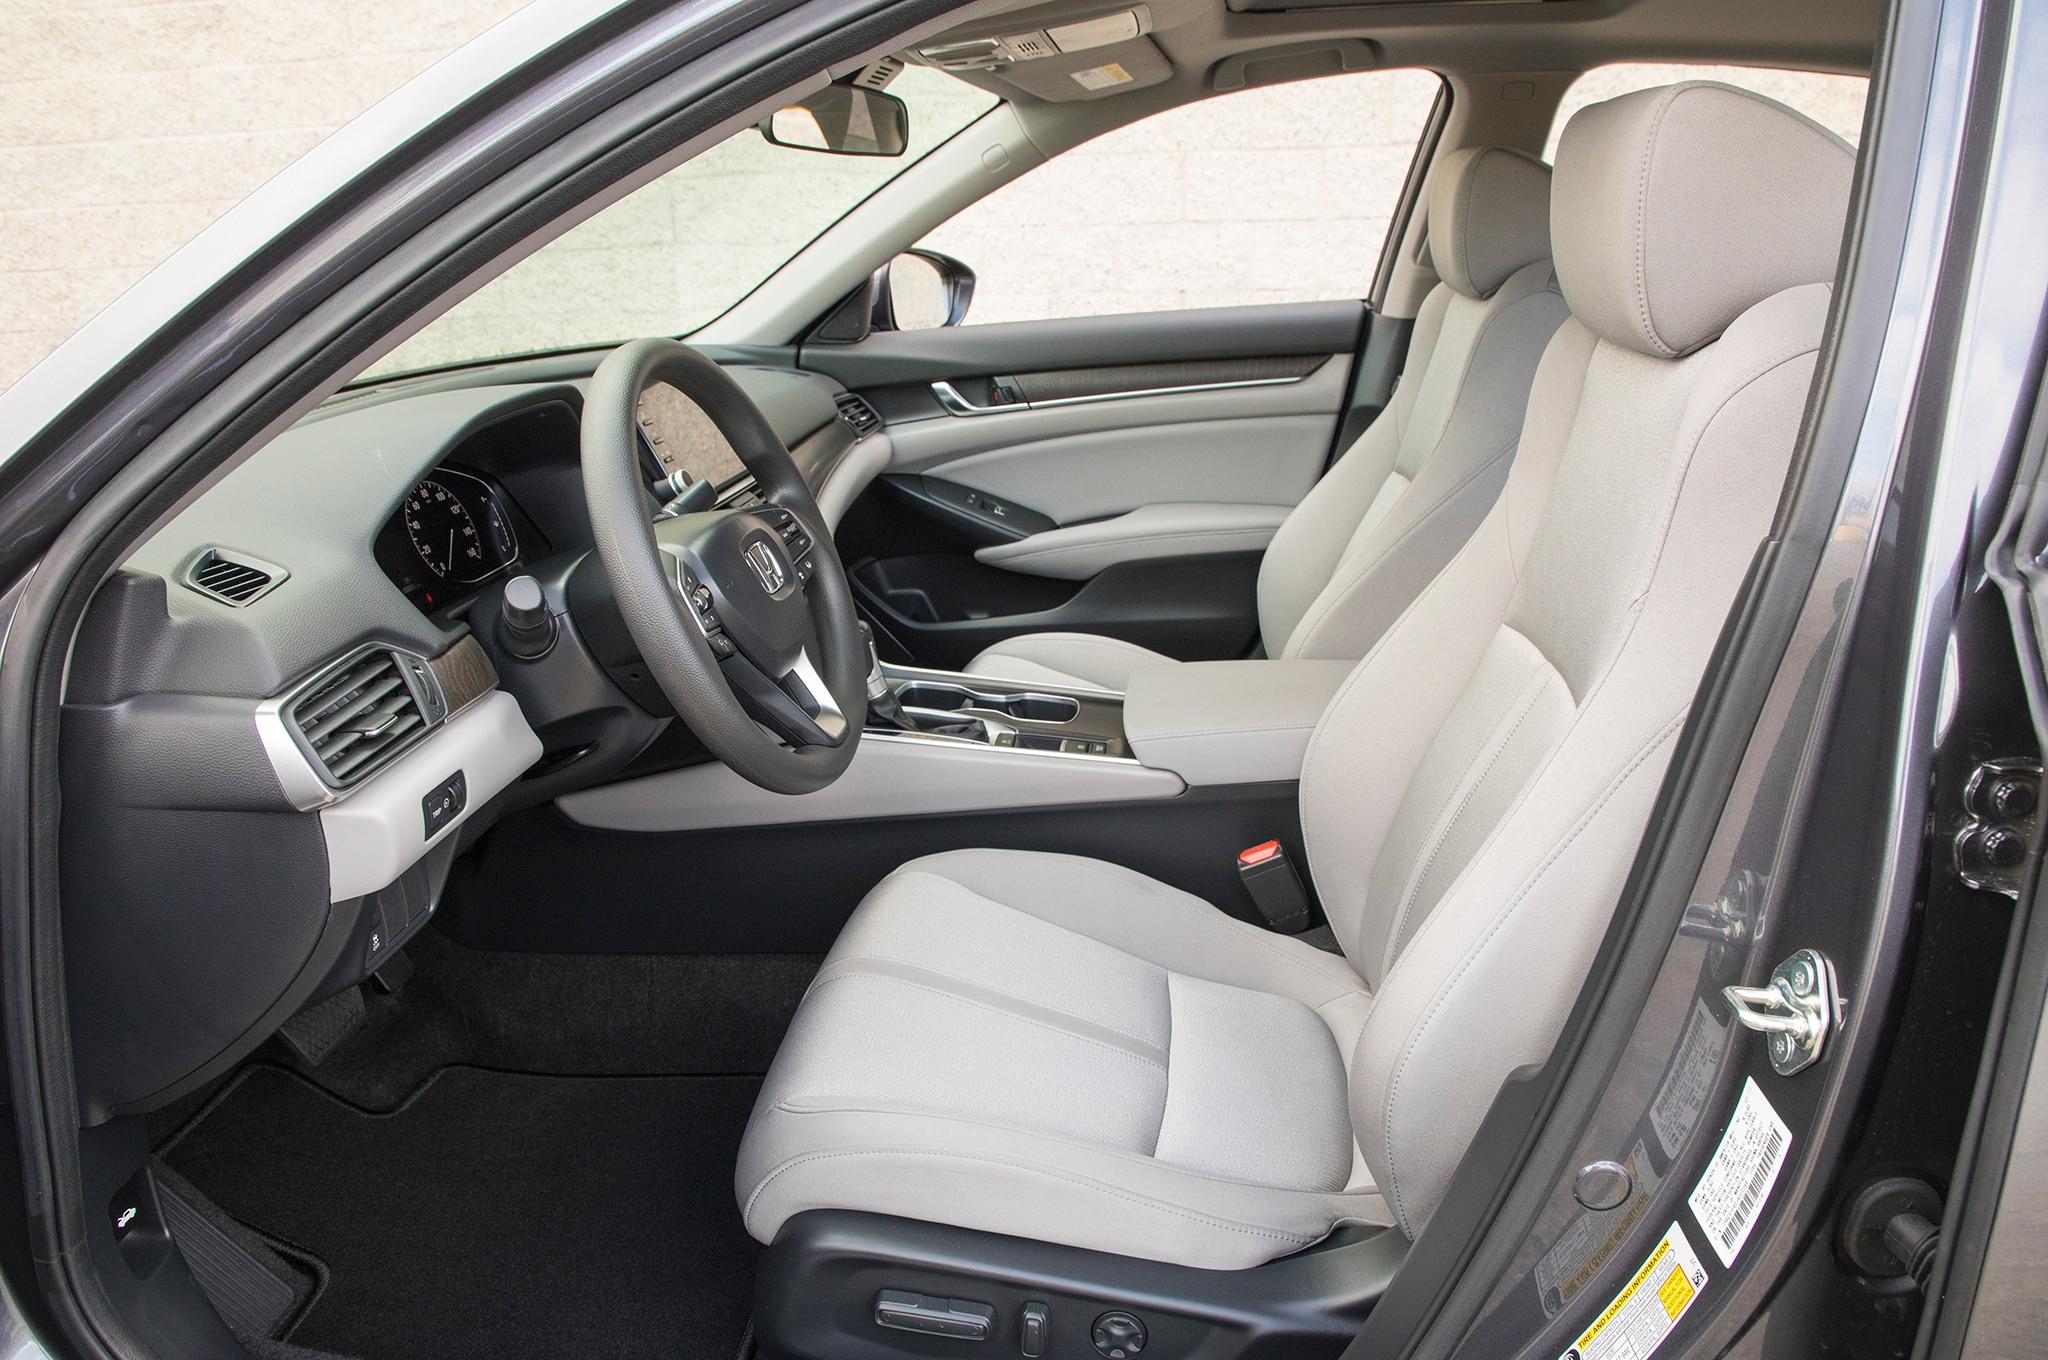 2018 Honda Accord 1 5 Front Interior 01 Motor Trend En